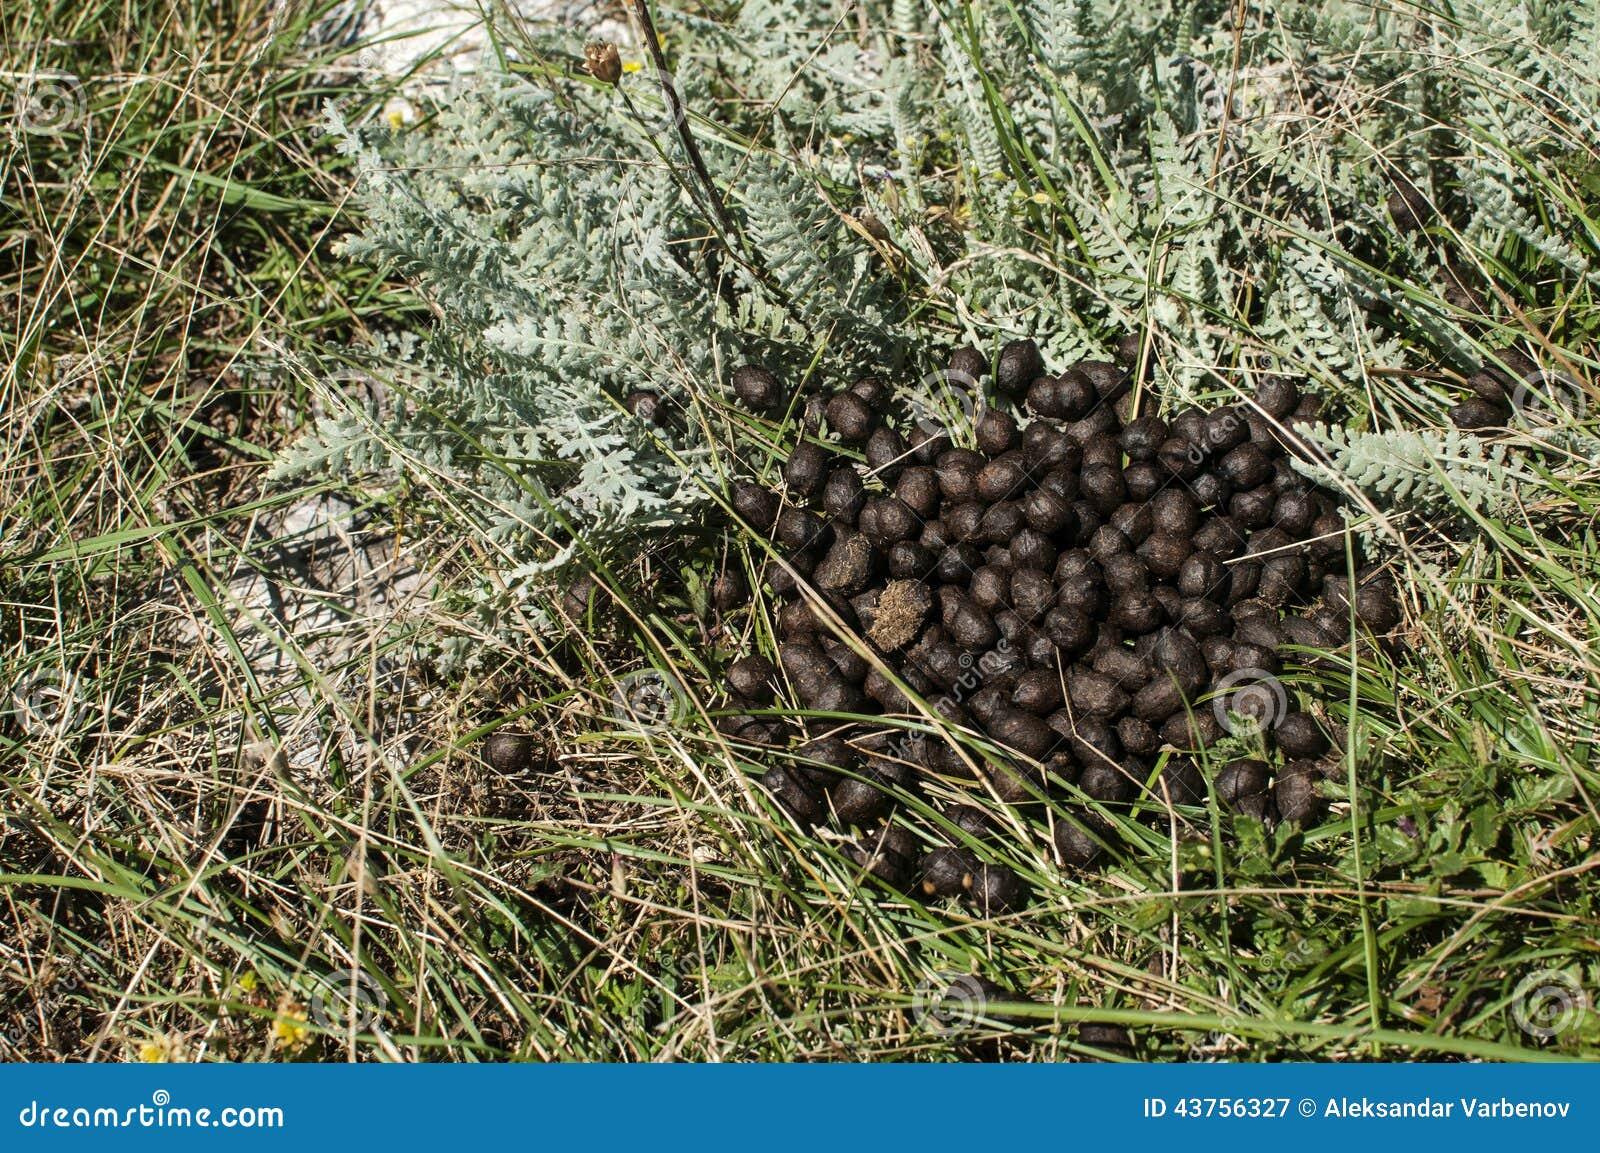 sheep droppings stock image. image of droppings, manure - 43756327